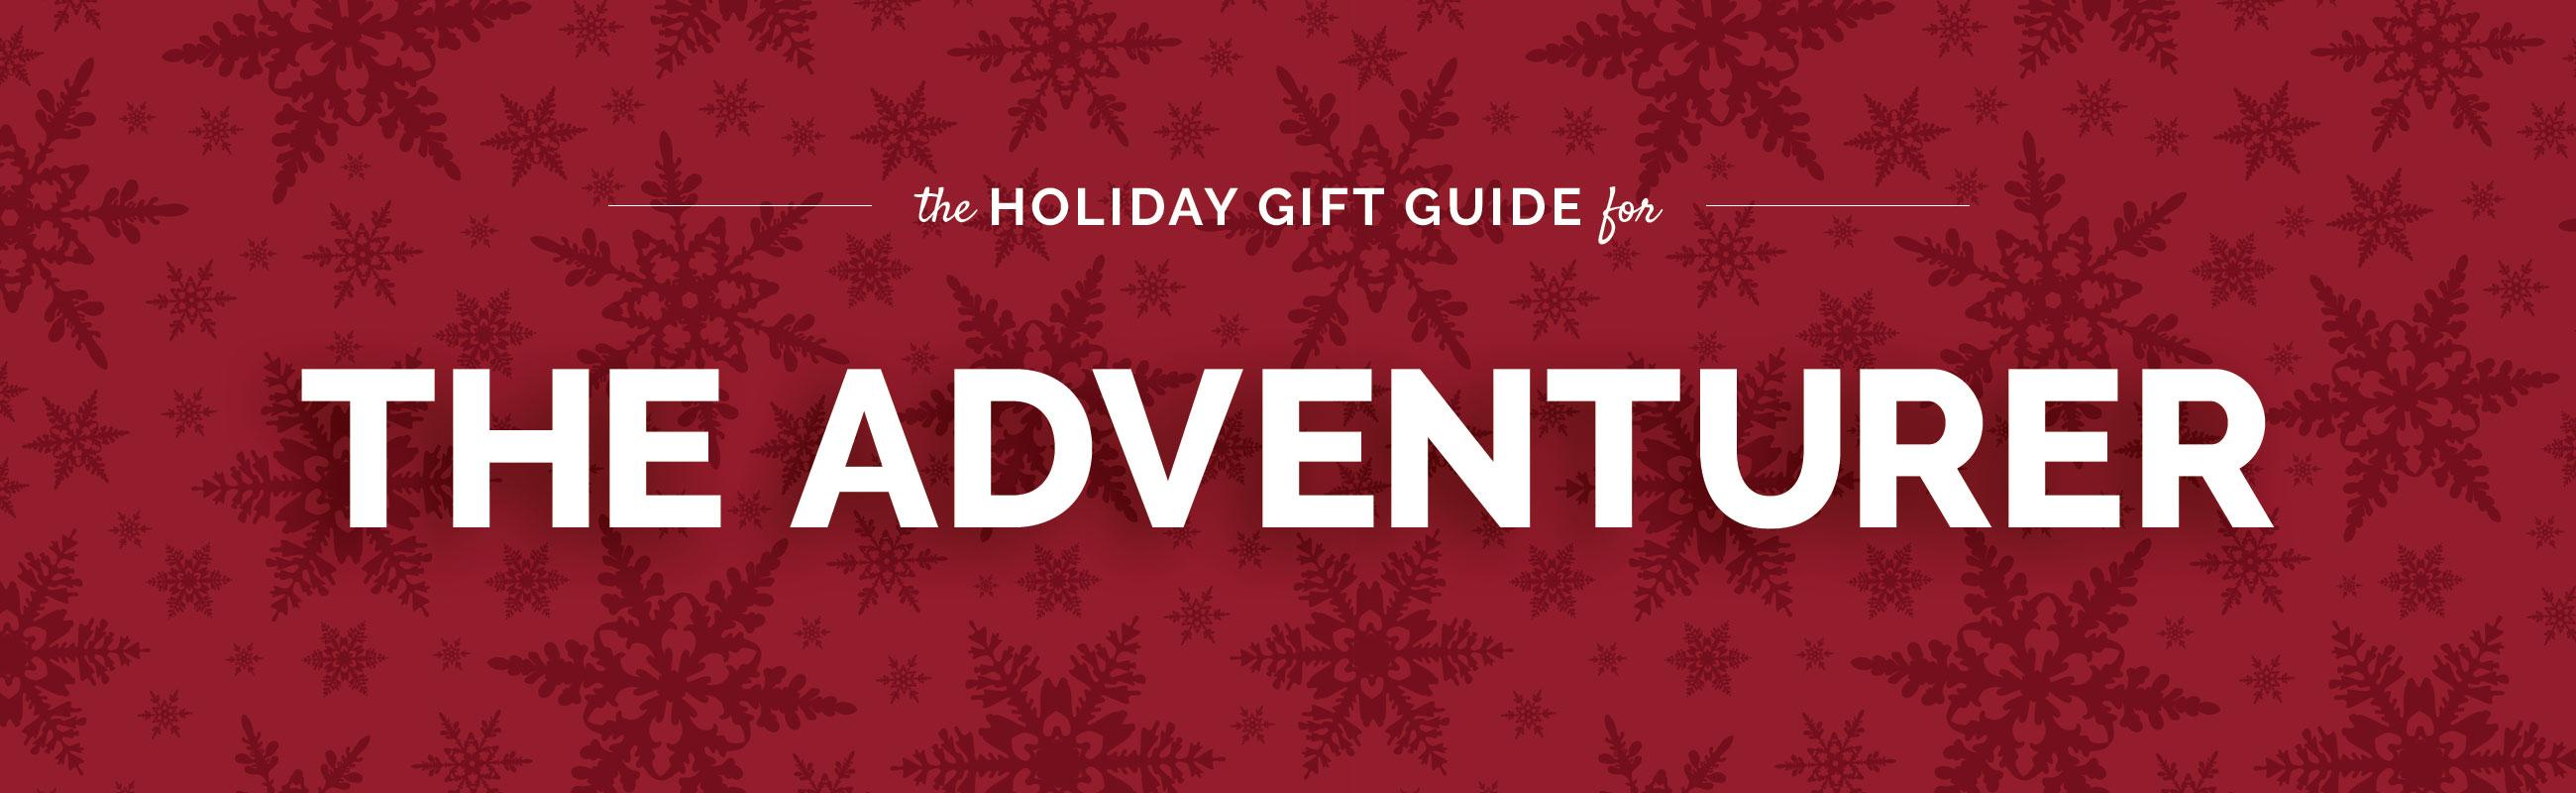 The Adventurer Gift Guide